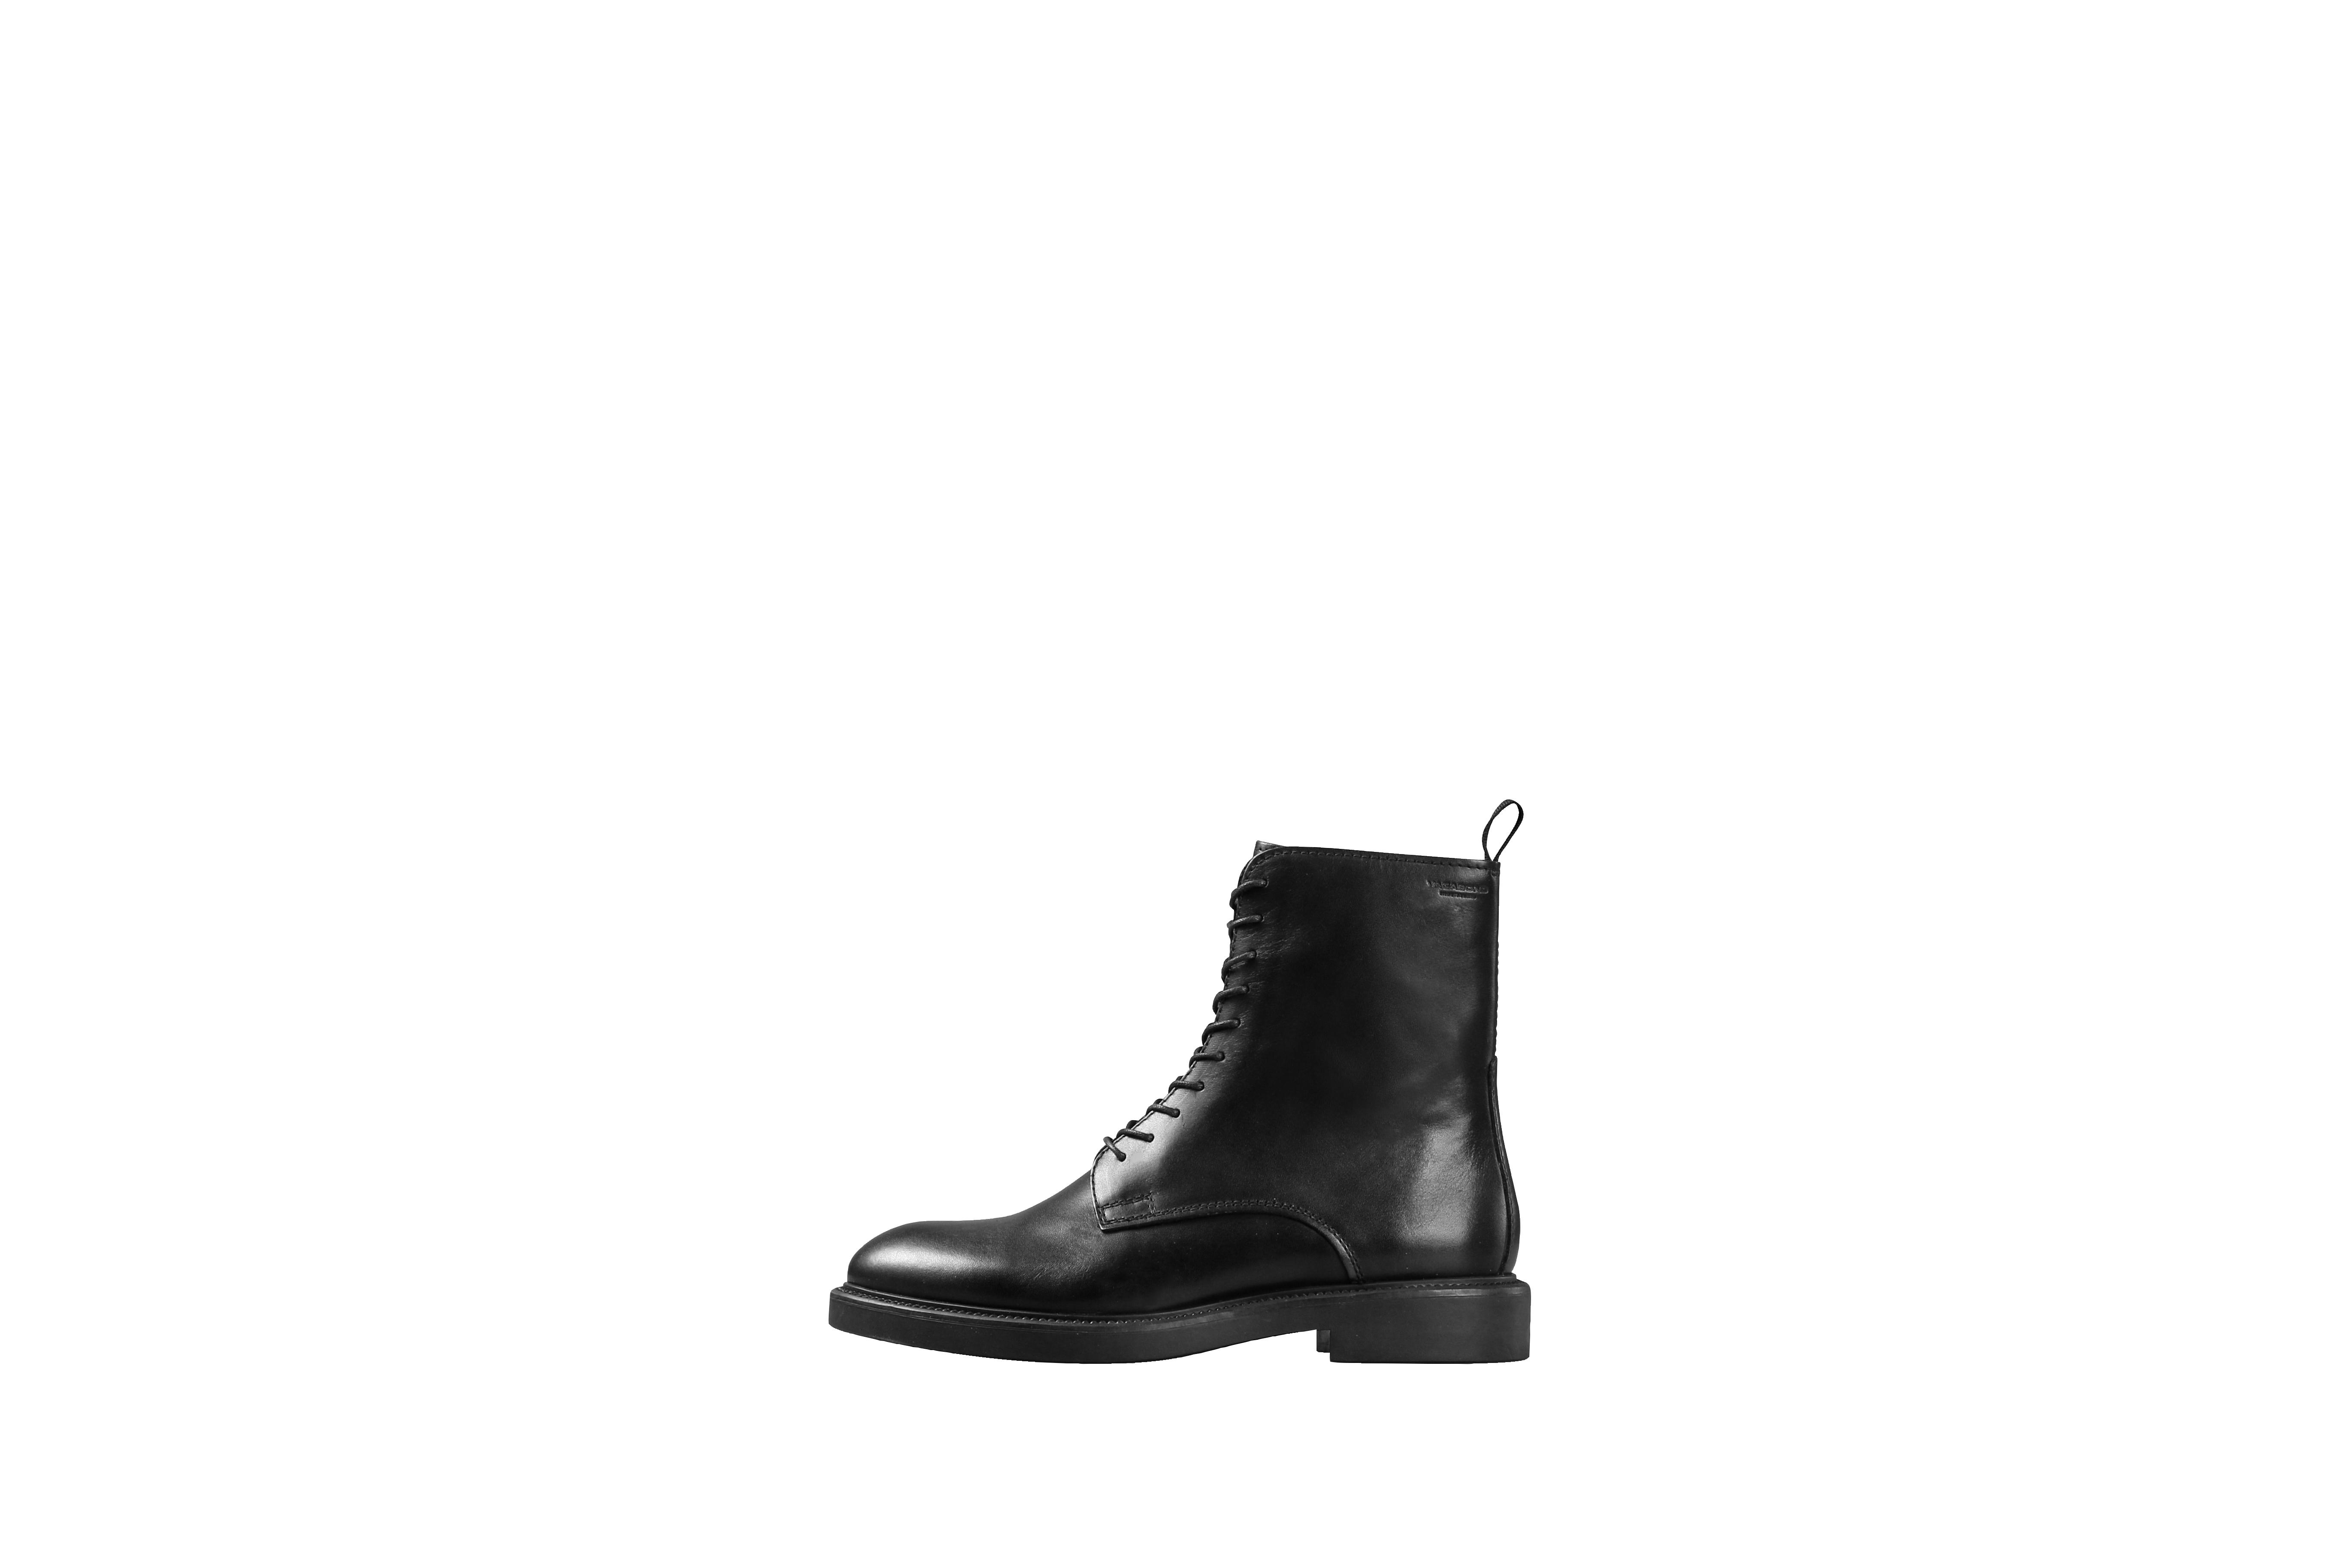 Vagabond Alex W støvle